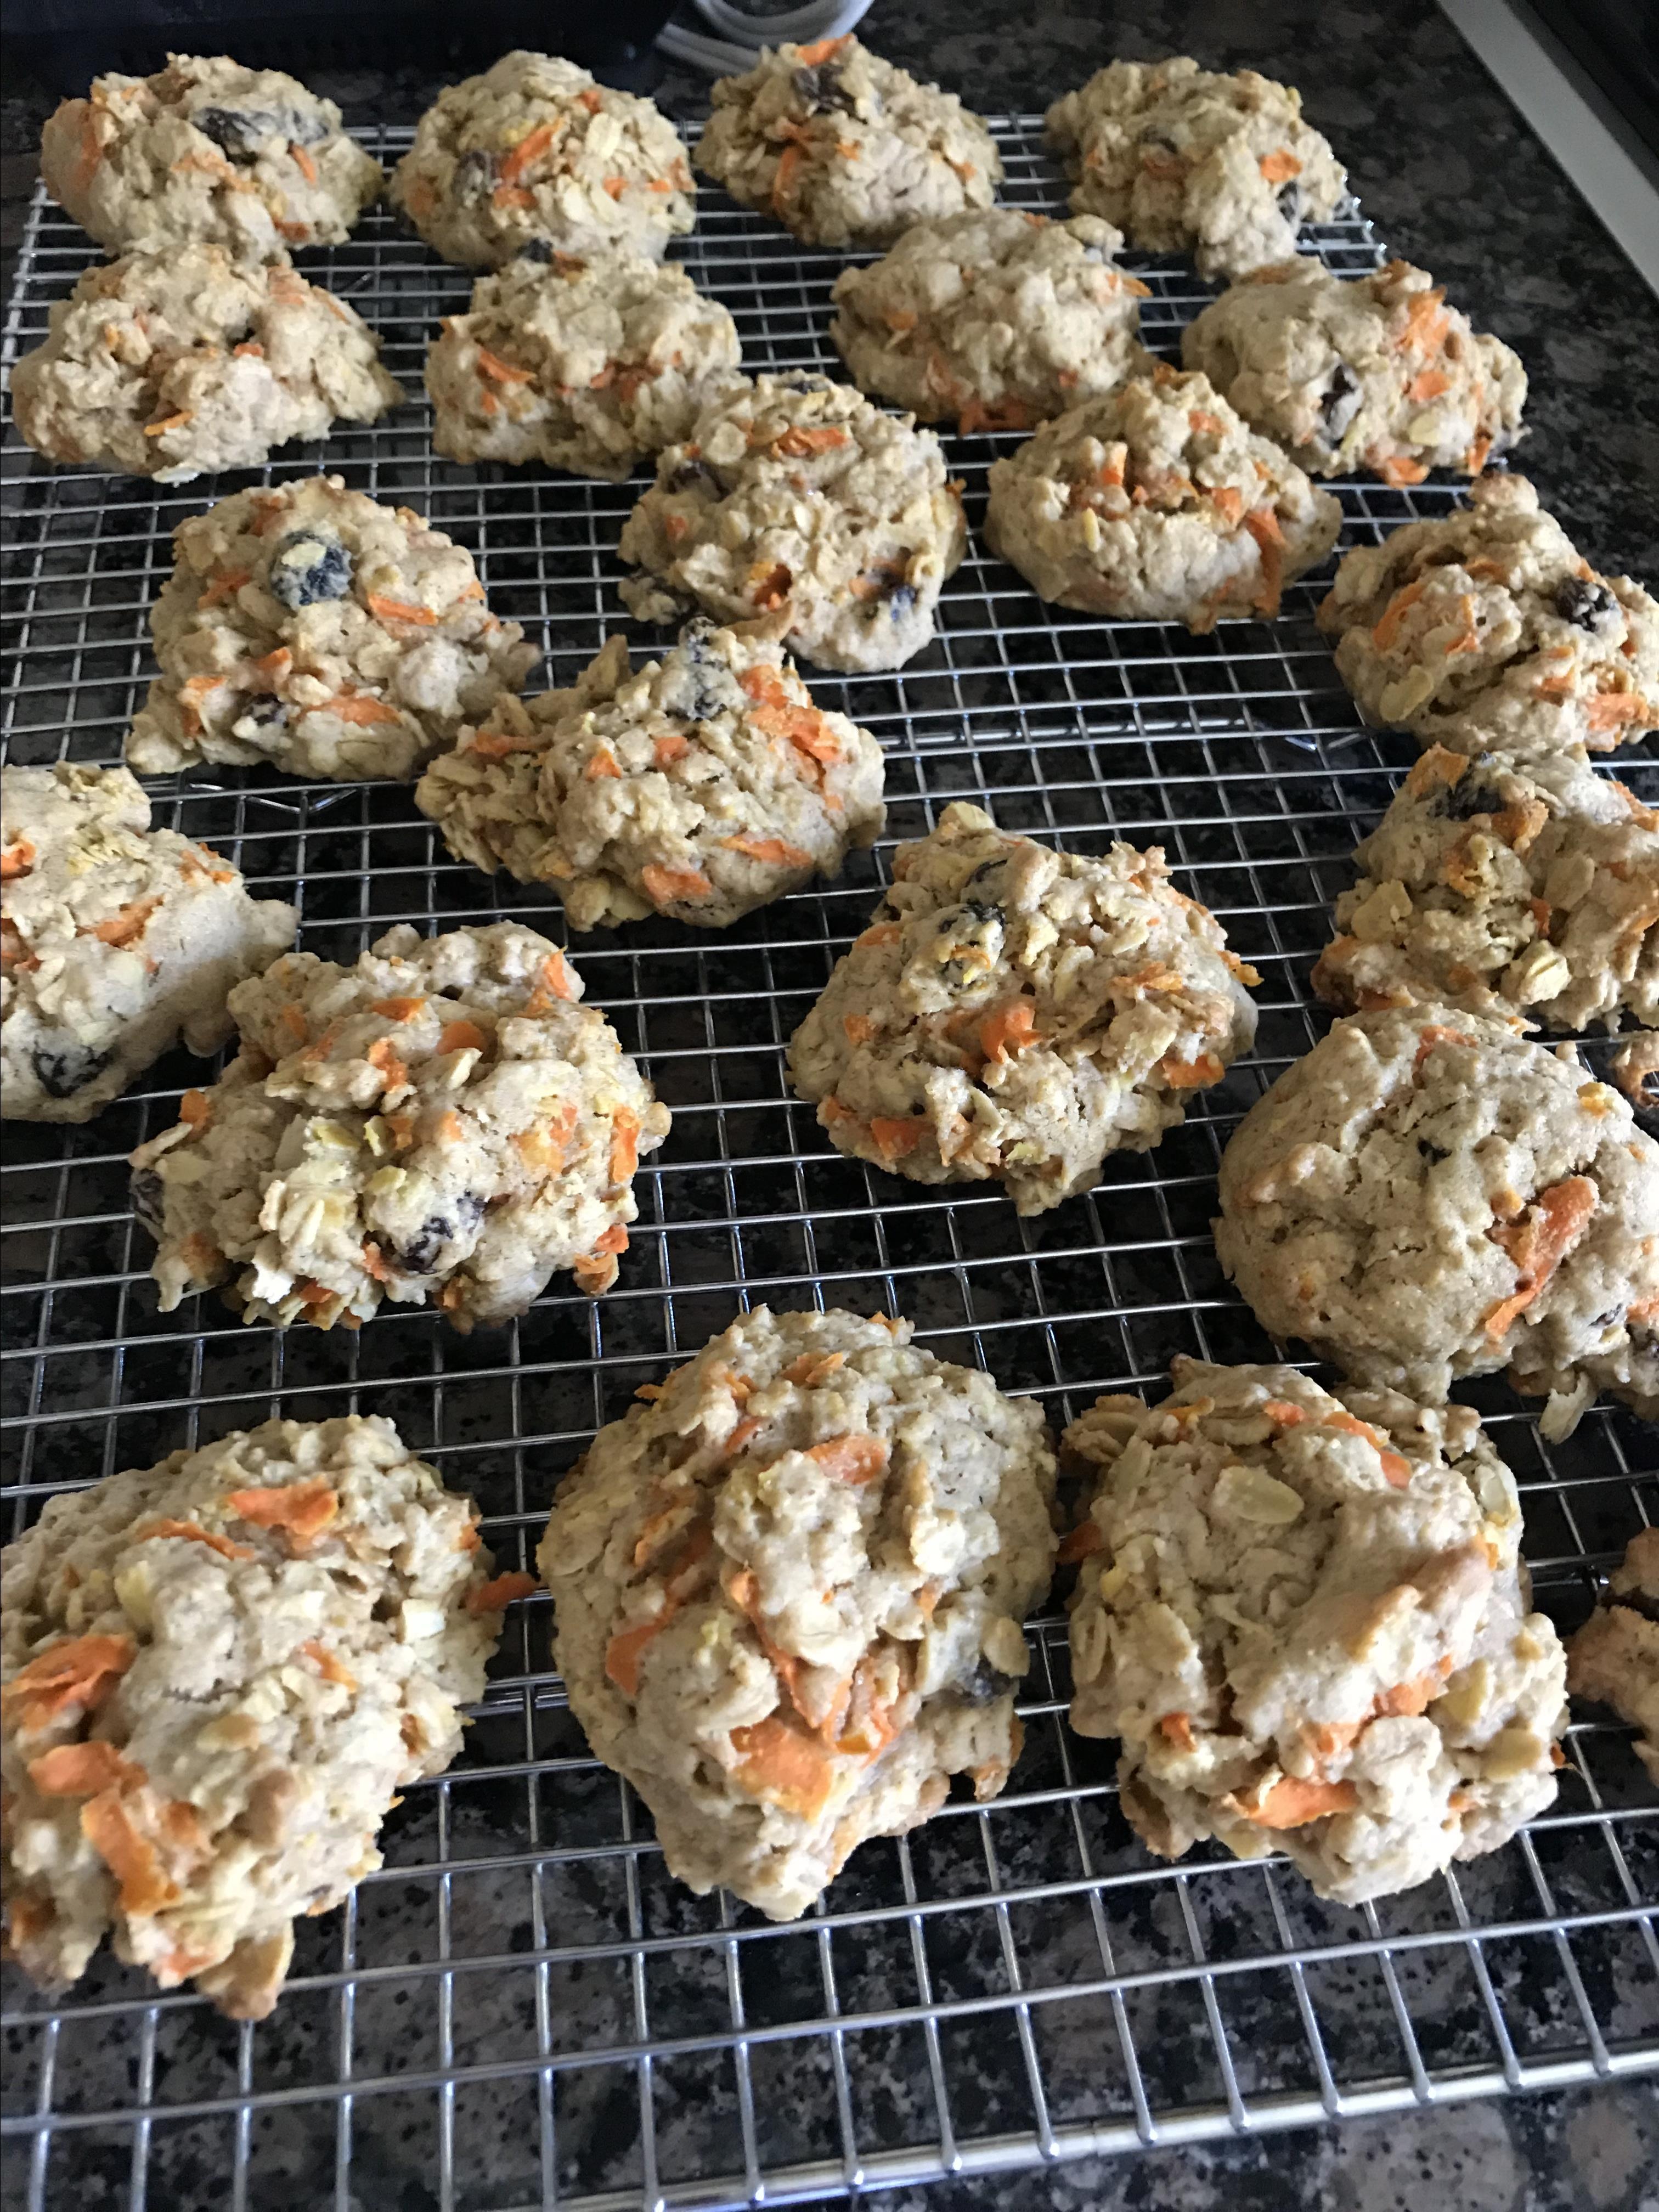 Oatmeal Carrot Cookies cindy